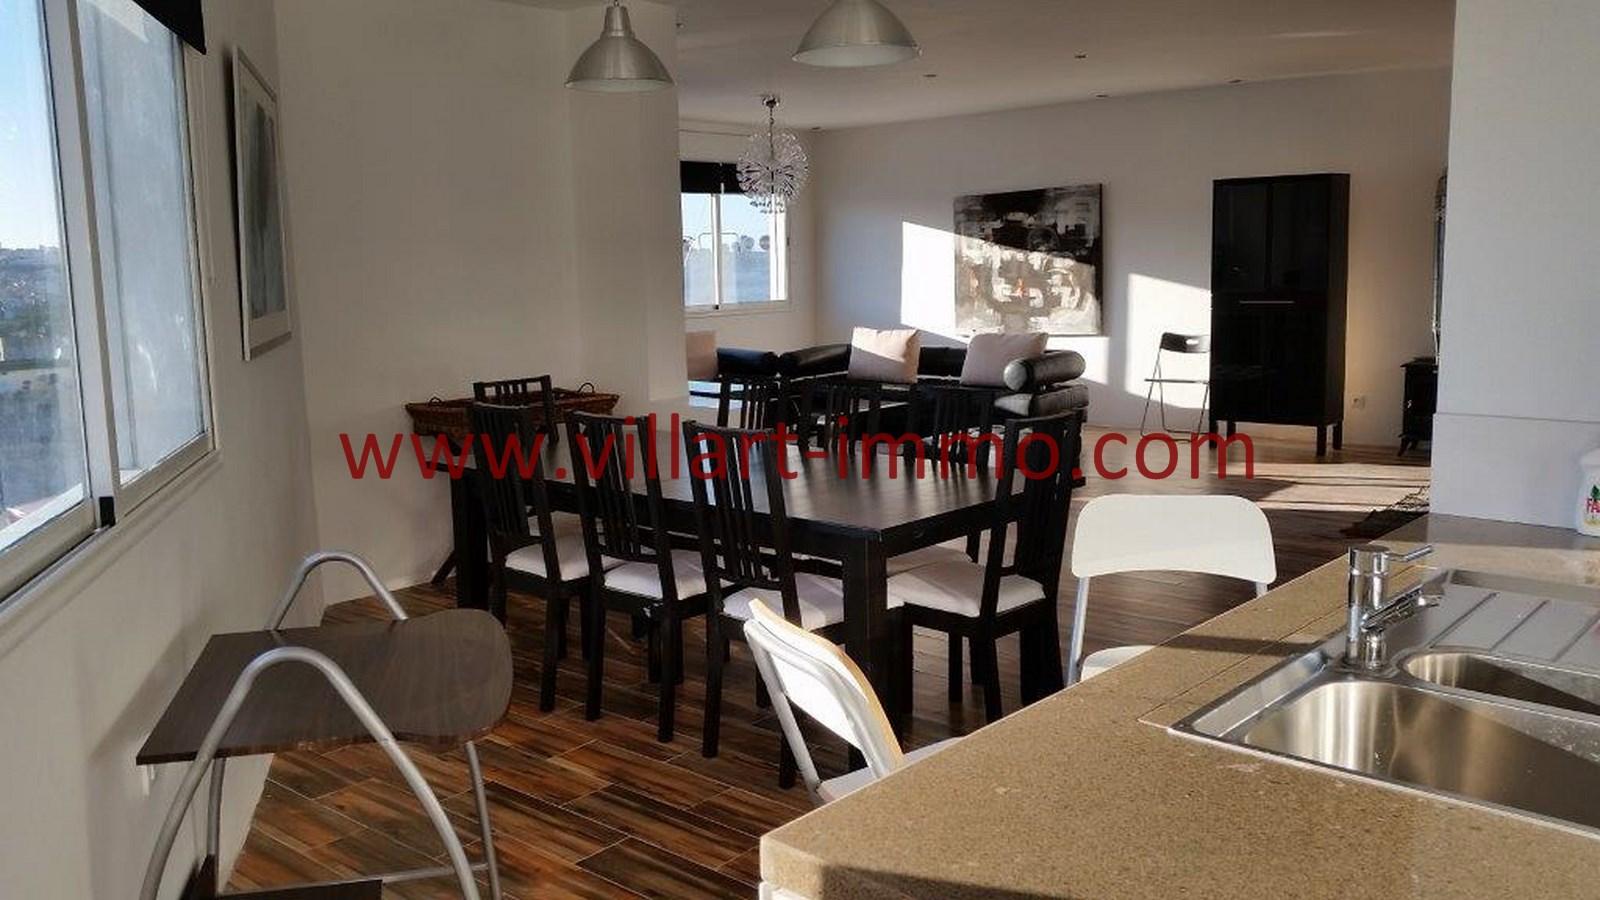 6-Vente-Appartement-Tanger-Centre-De-Ville-Cuisine 1-VA518-Villart Immo